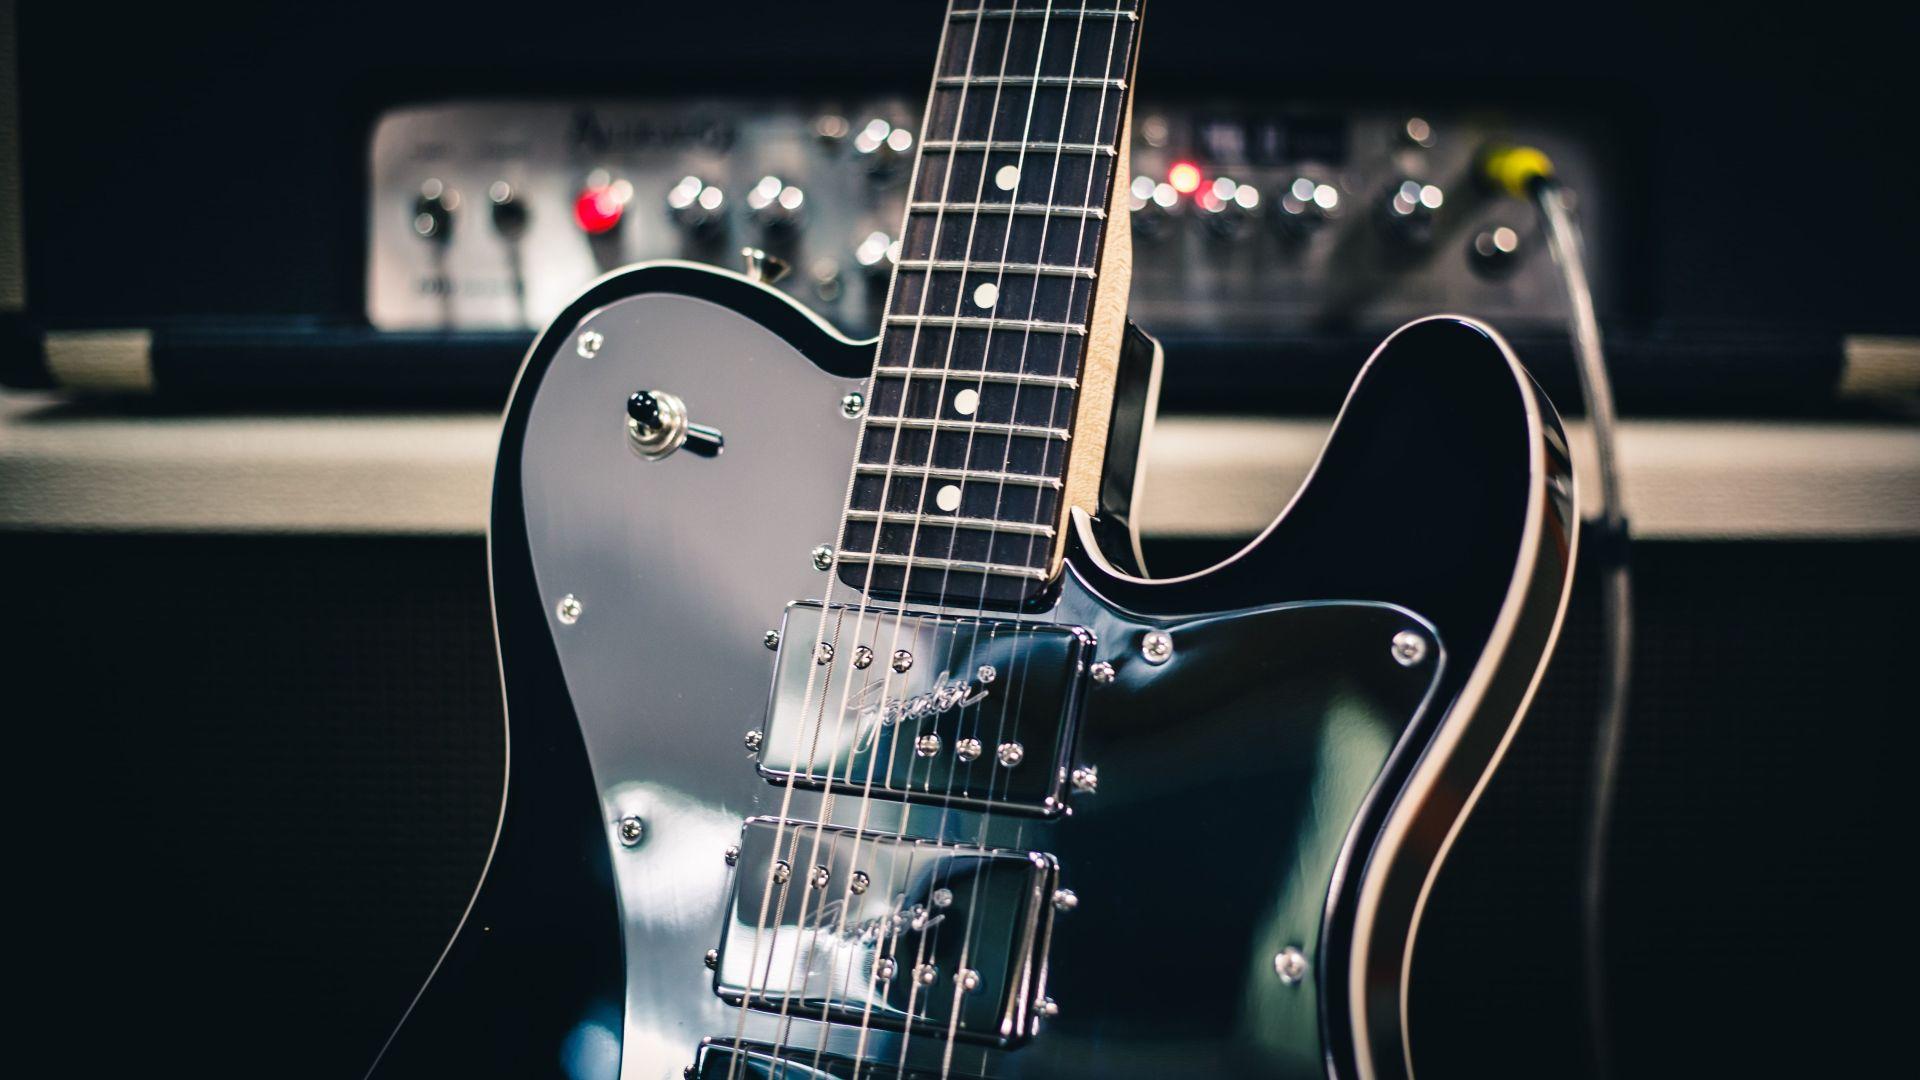 Fender Guitar, Best Wallpaper